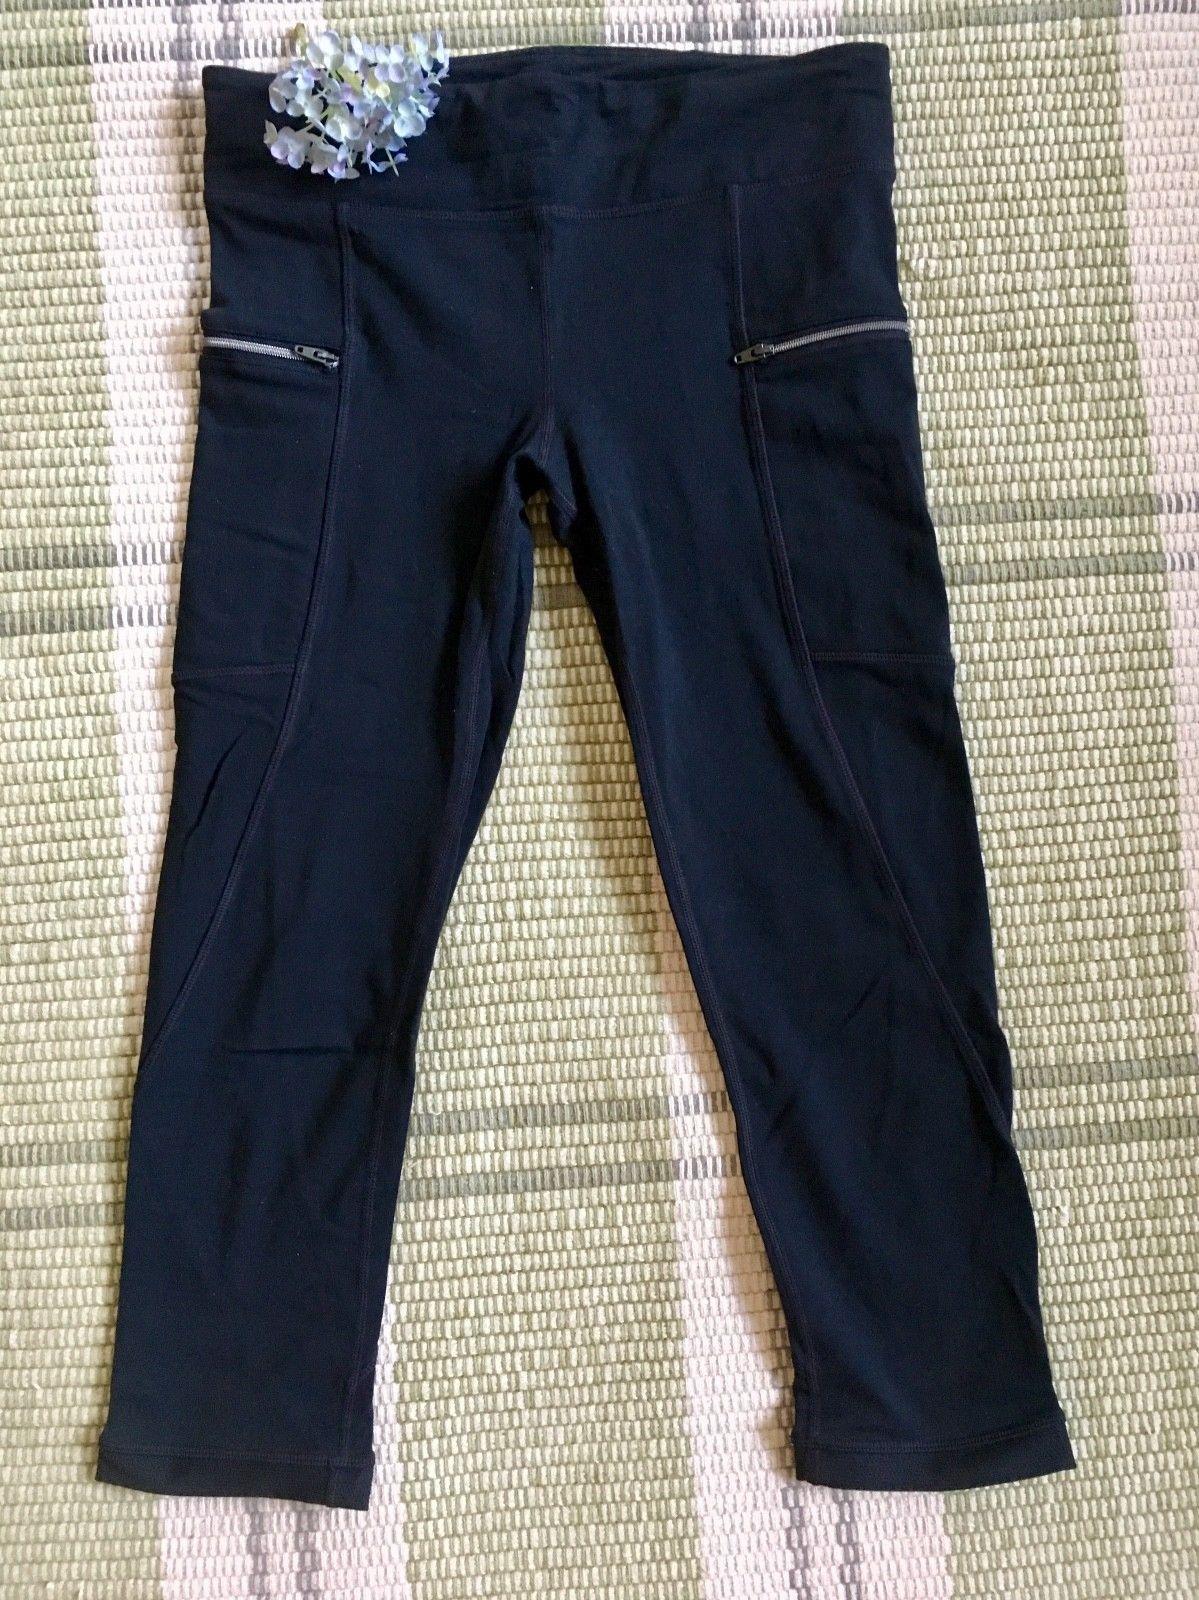 9b980f9c01f1aa Athleta Girl Crop Leggings Capri Athletic and 50 similar items